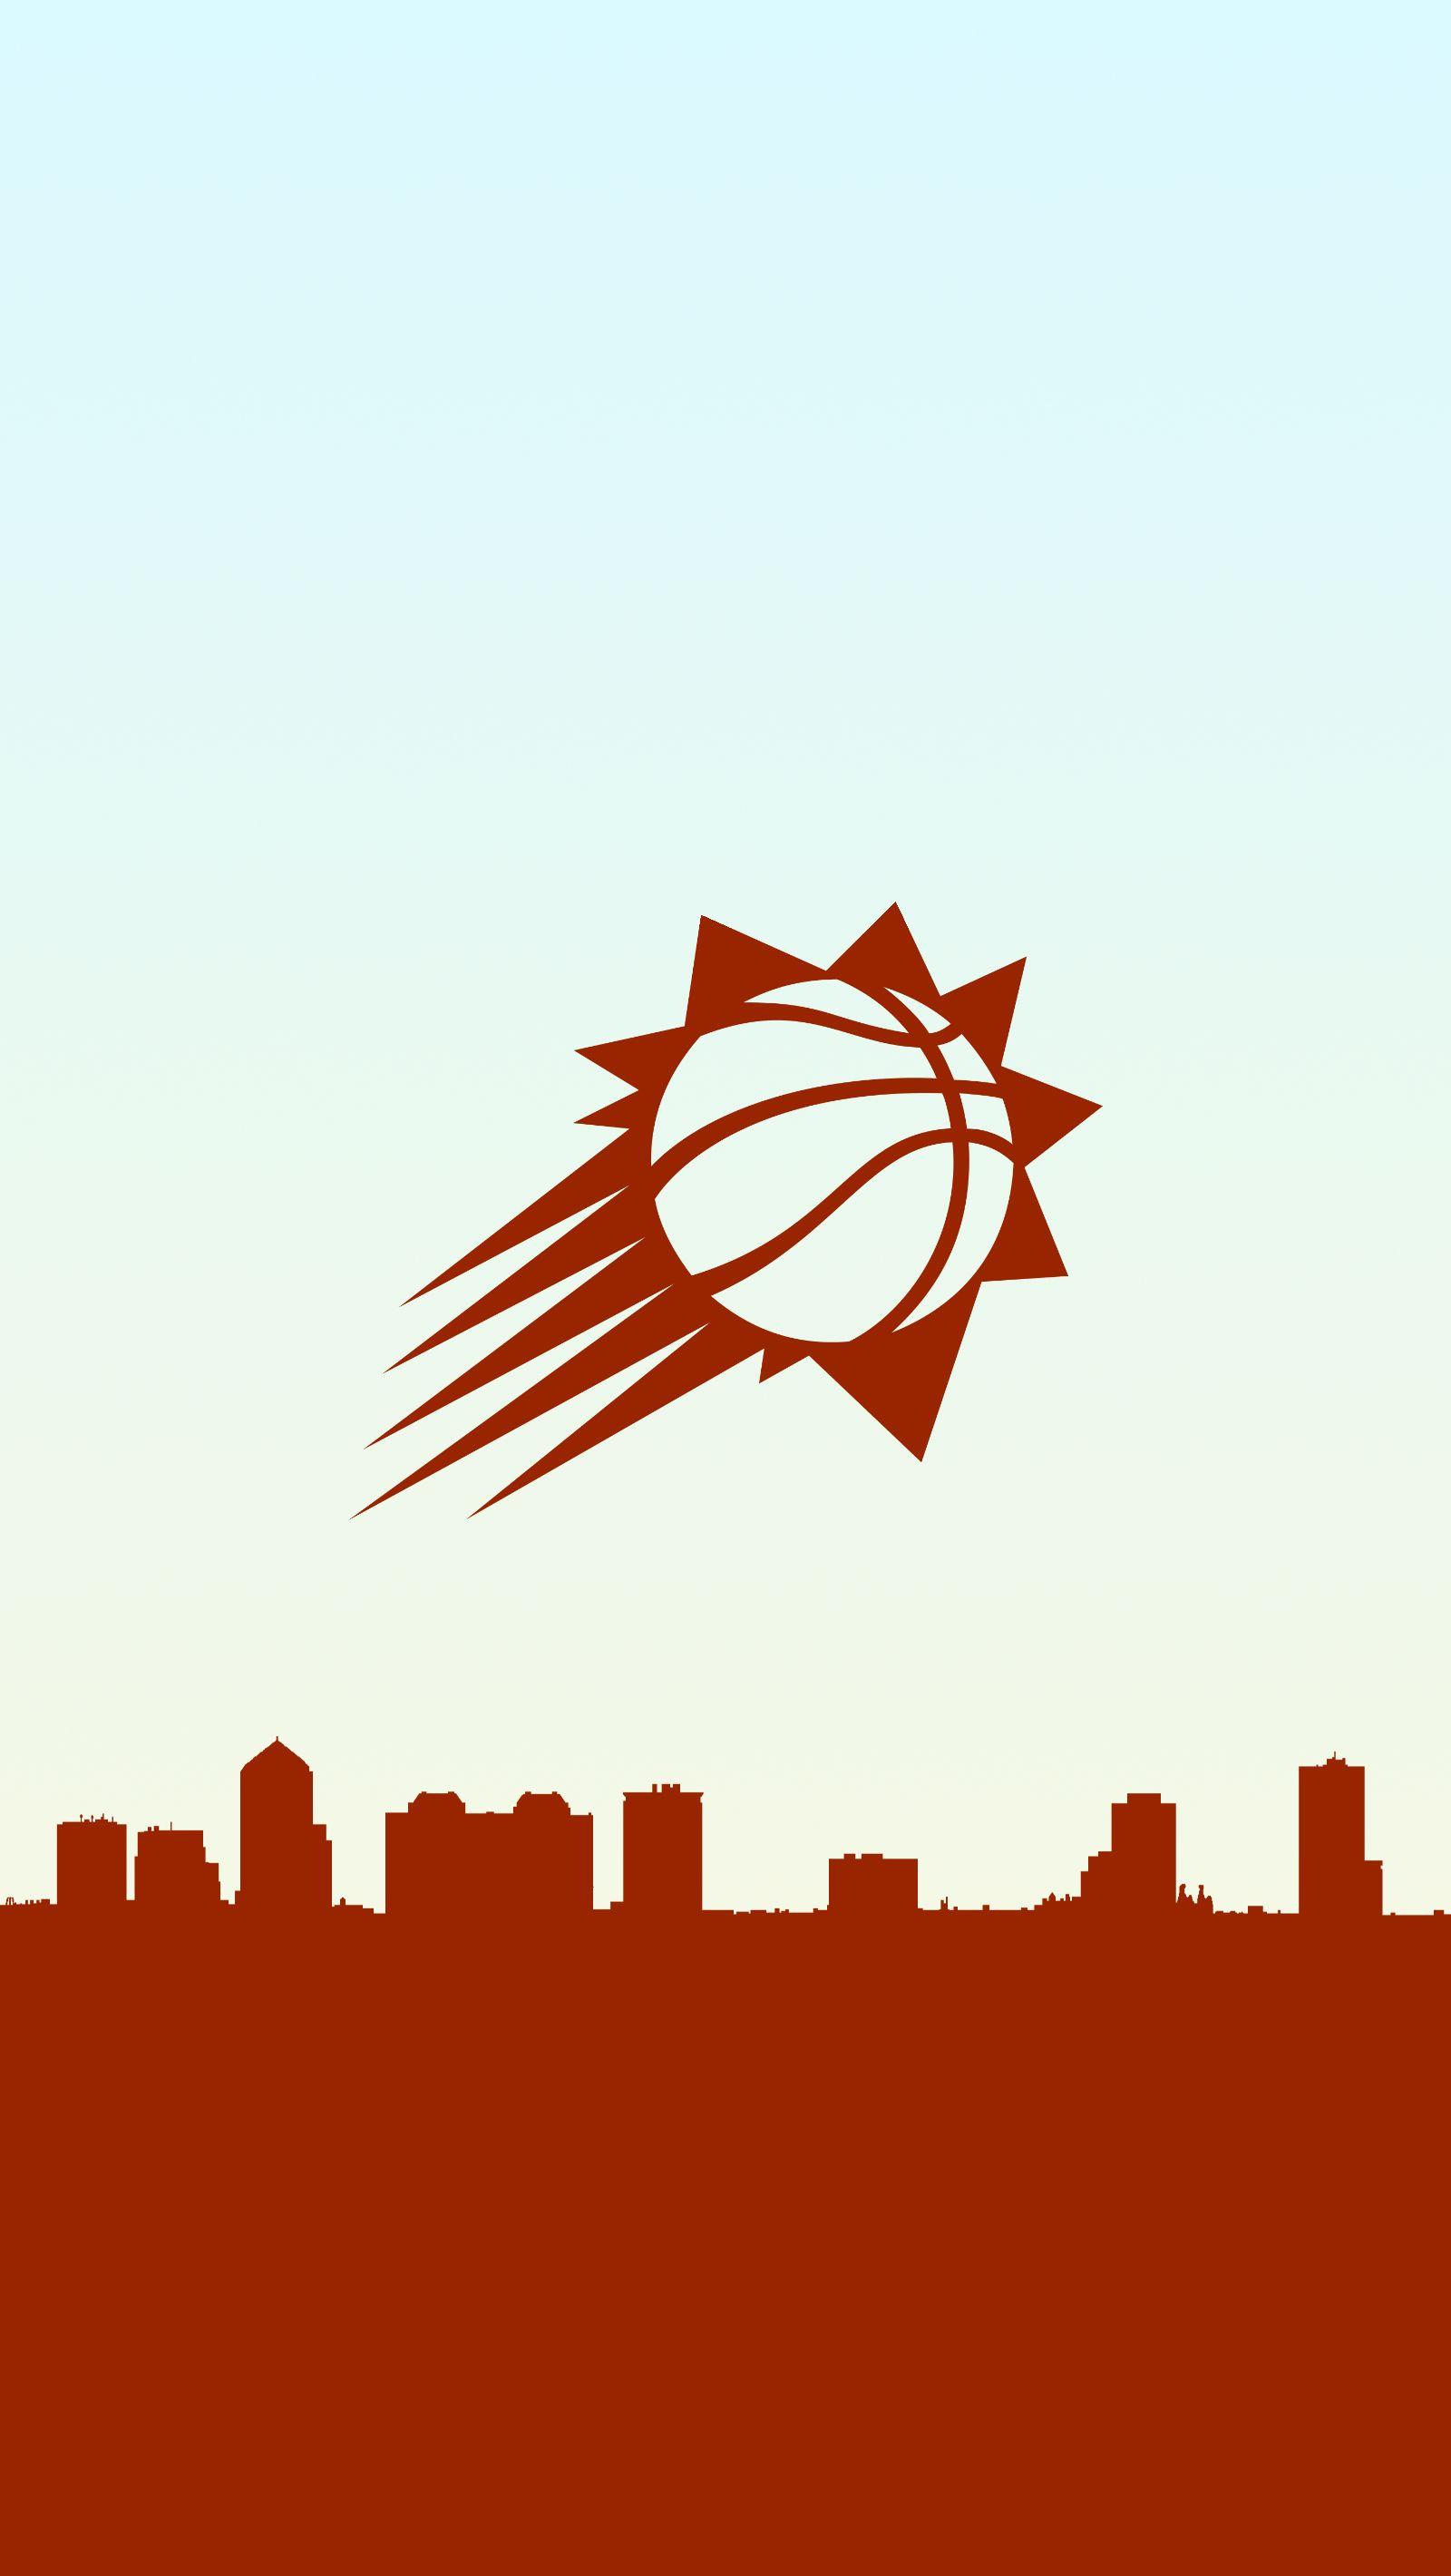 Phoenix Suns Basketball Phone Background Basketball Wallpaper Phoenix Suns Basketball Phoenix Suns